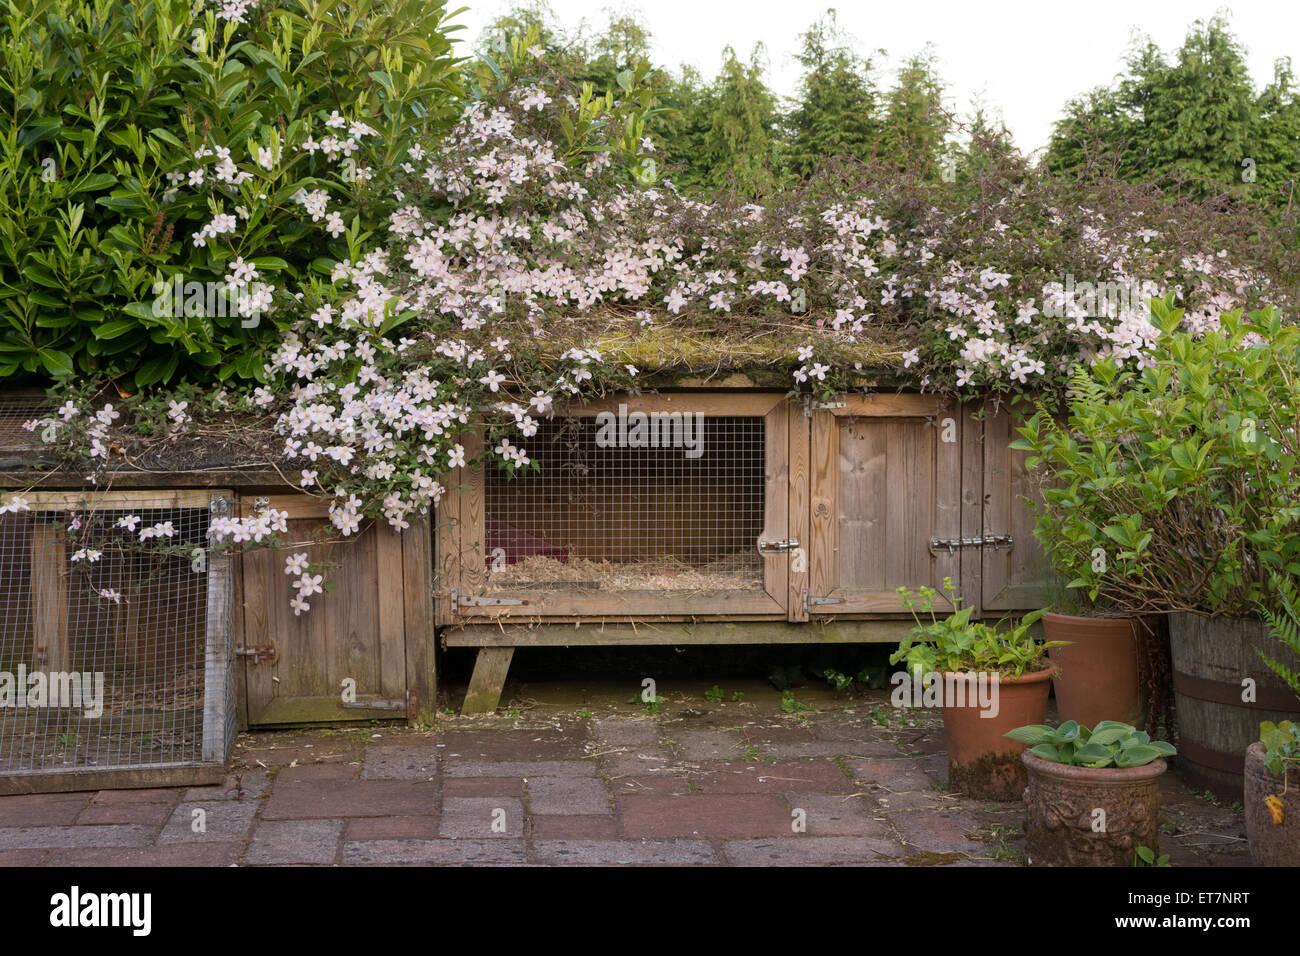 Clematis montana rubens blending a large rabbit hutch more sympathetically into the garden - Stock Image